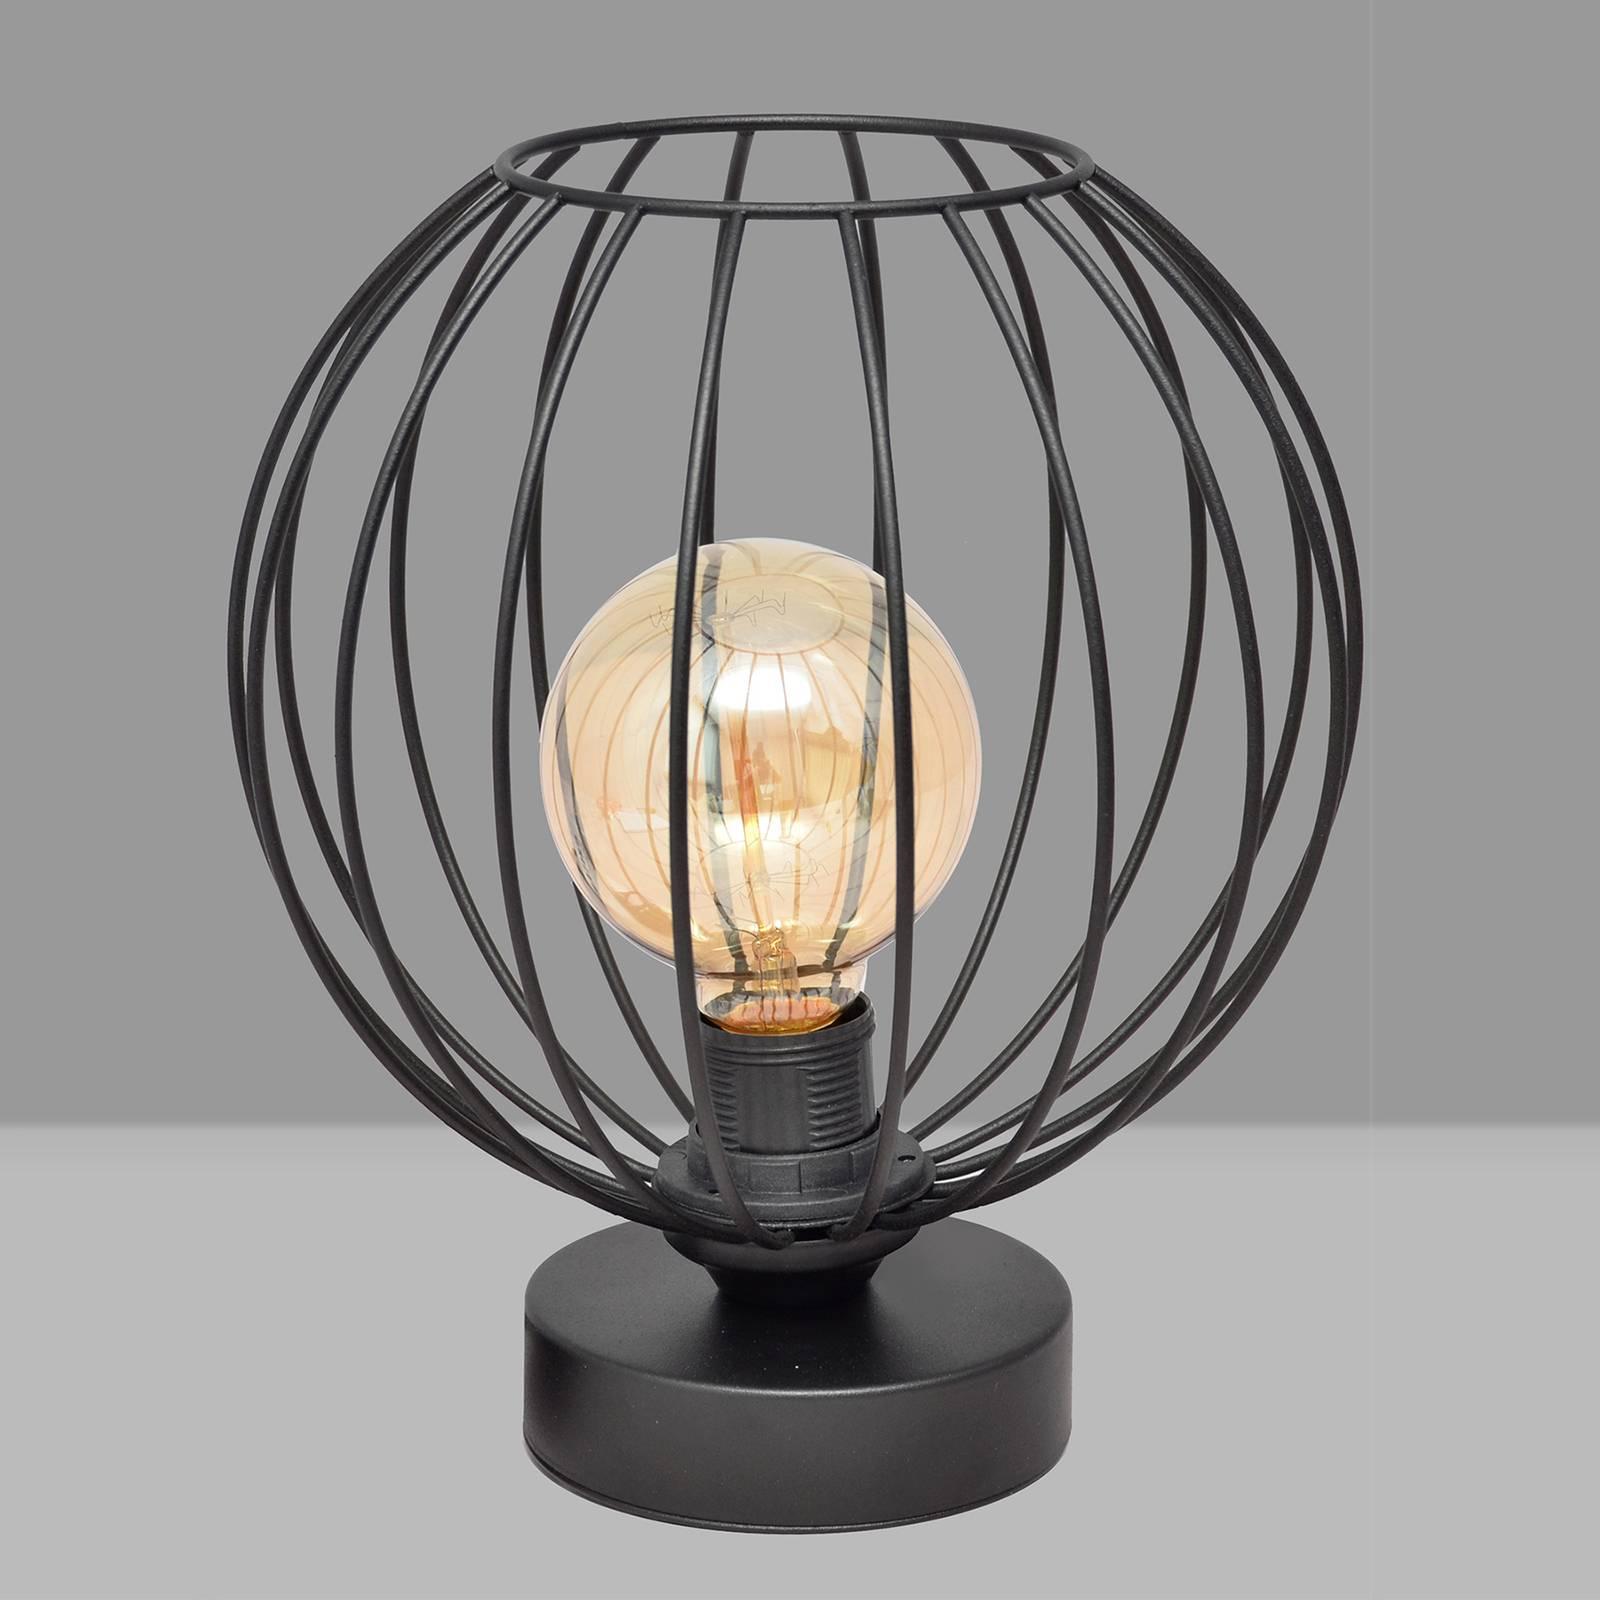 Pöytälamppu Cumera häkkivarjostimella, Ø 24 cm